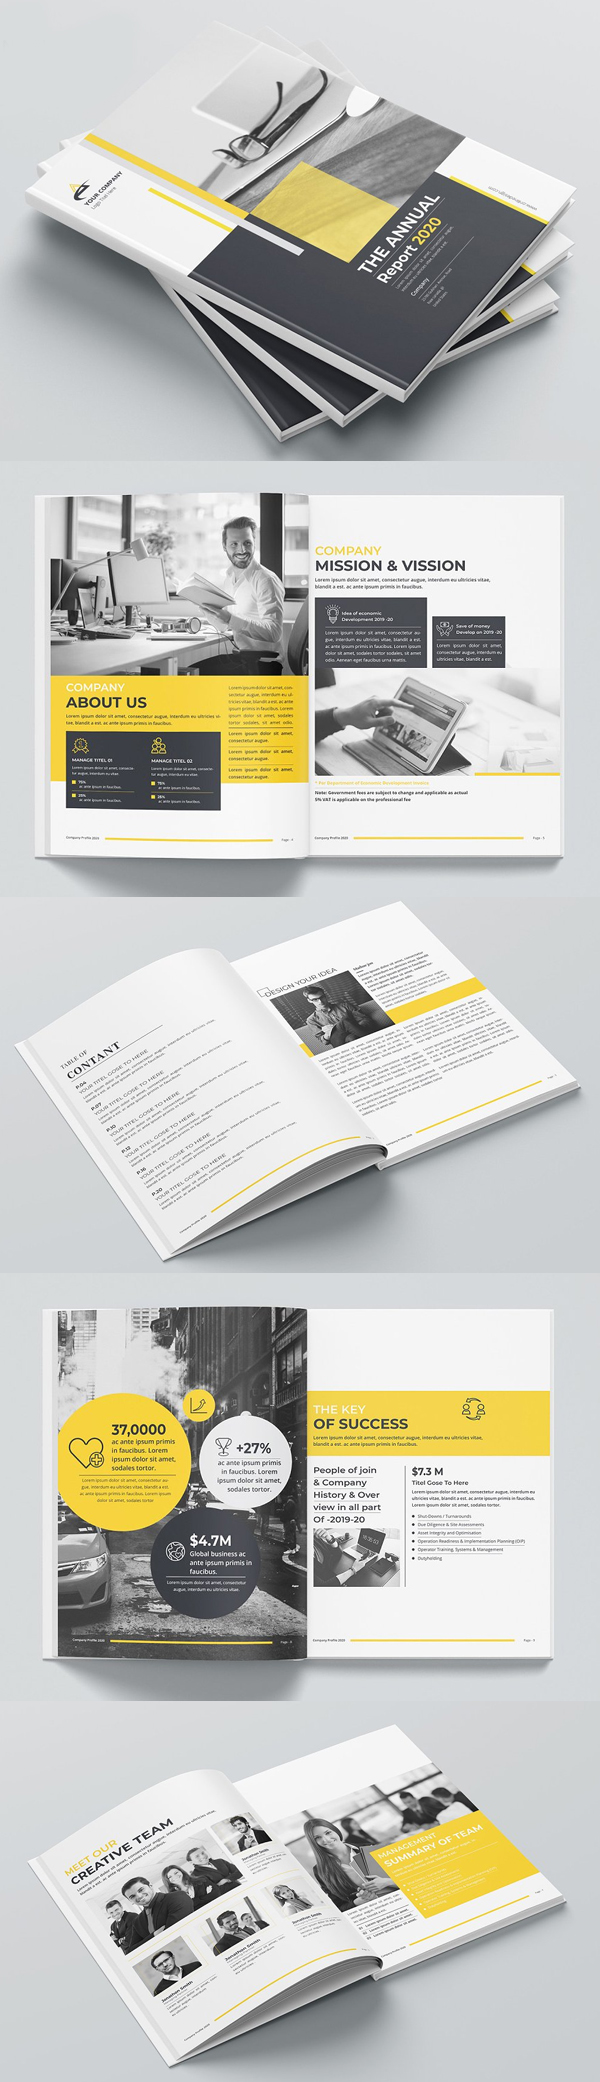 Creative Annual Report Brochure